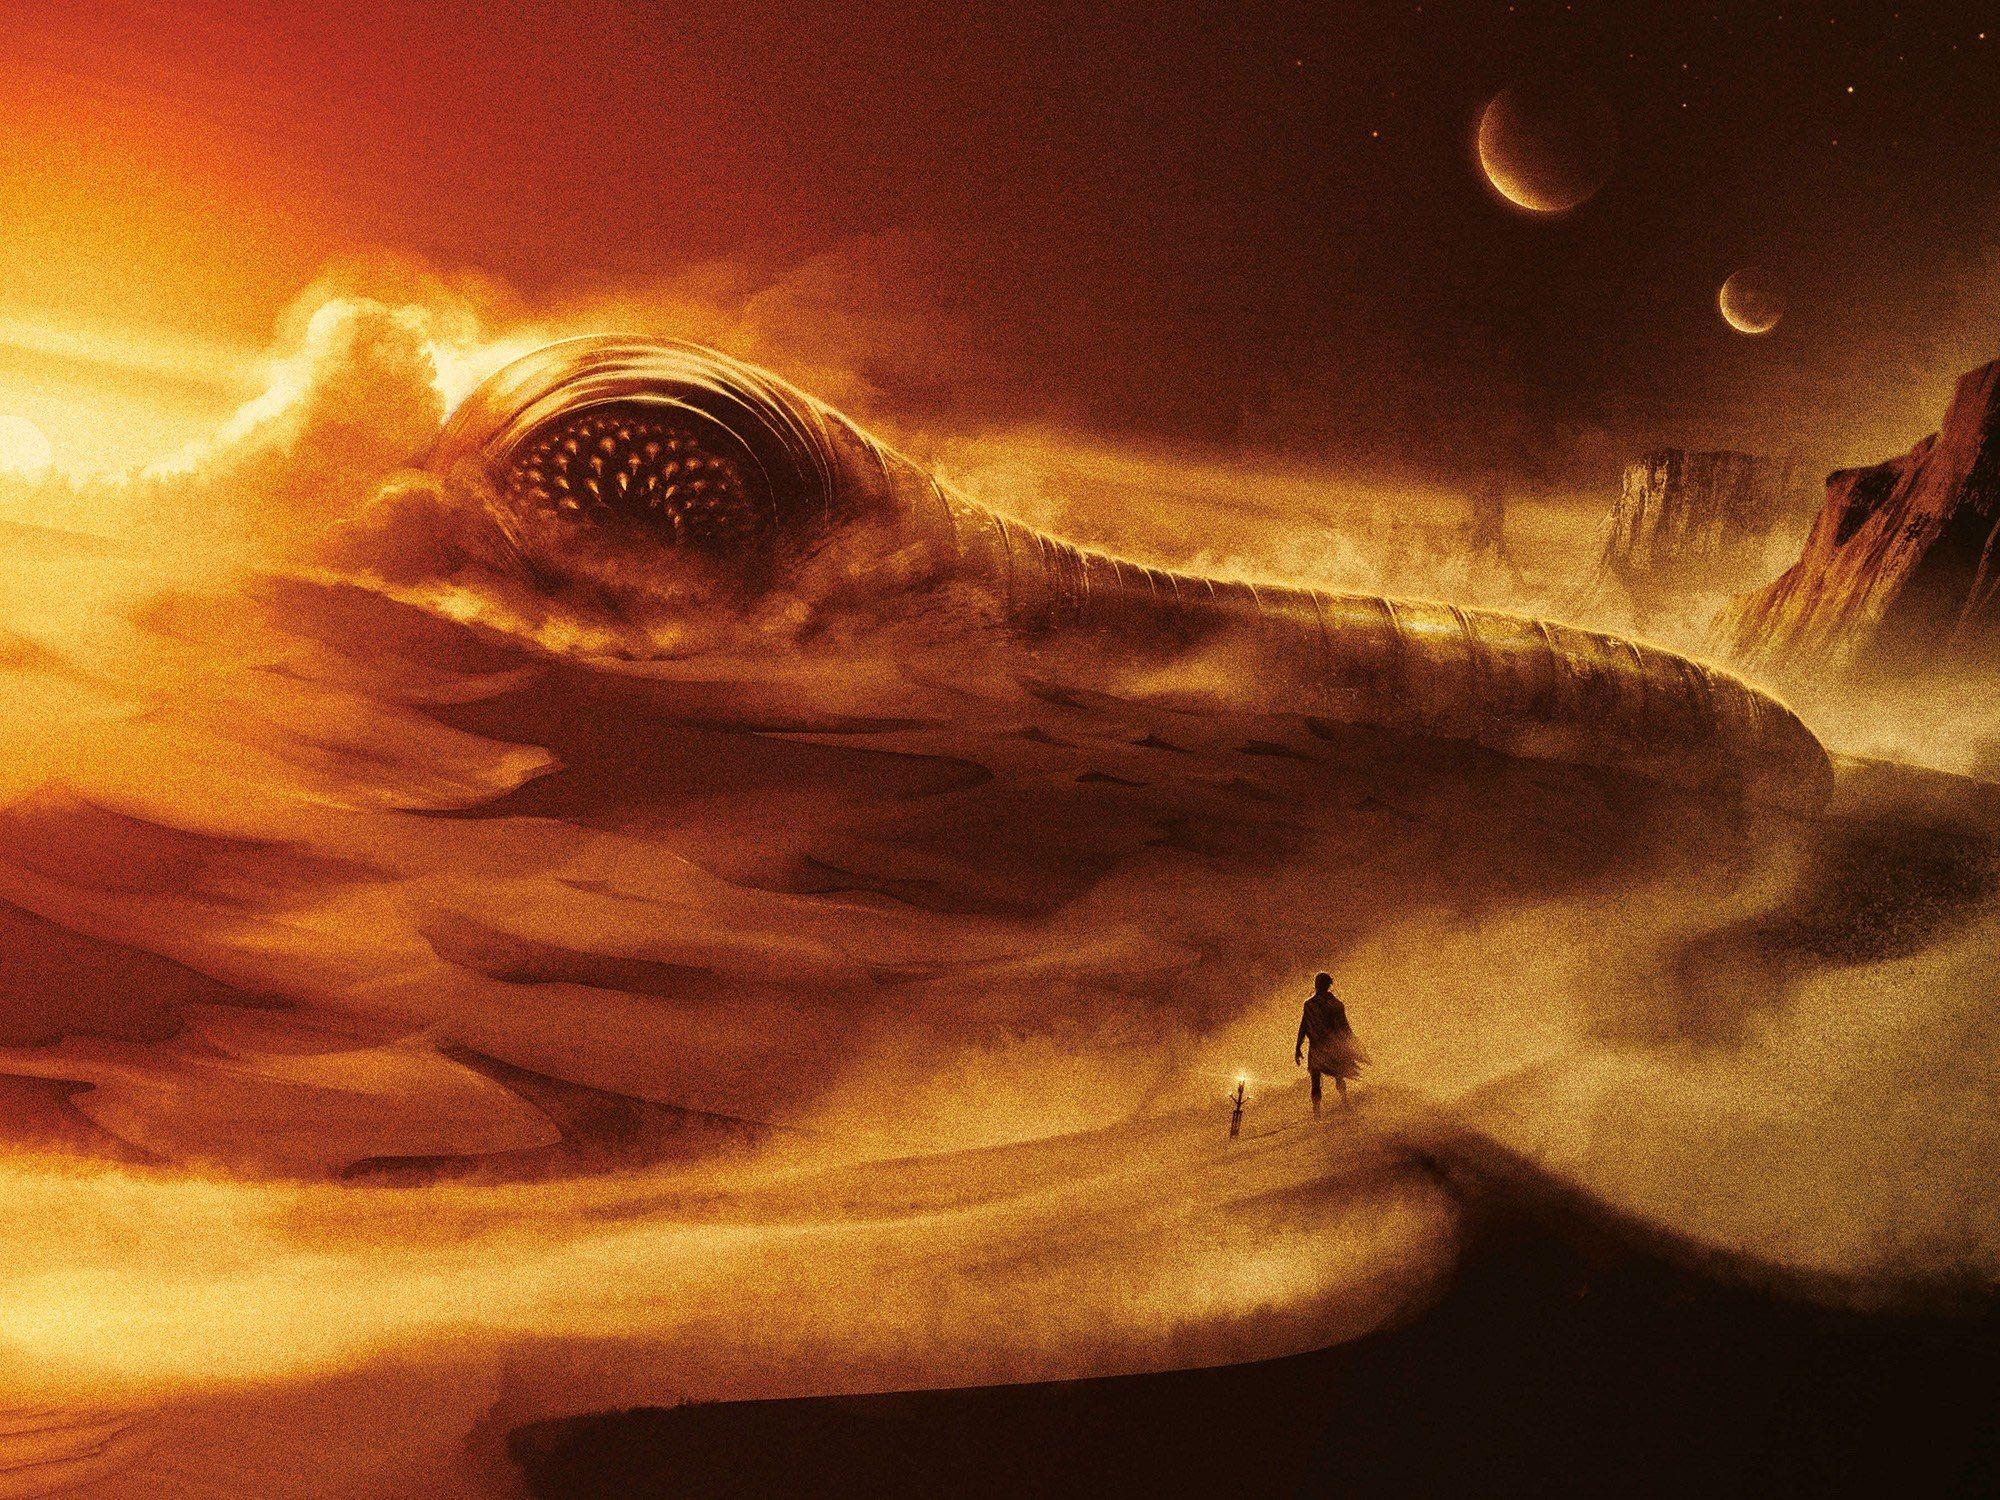 Trailer Trash! – Dune (Trailer #1)